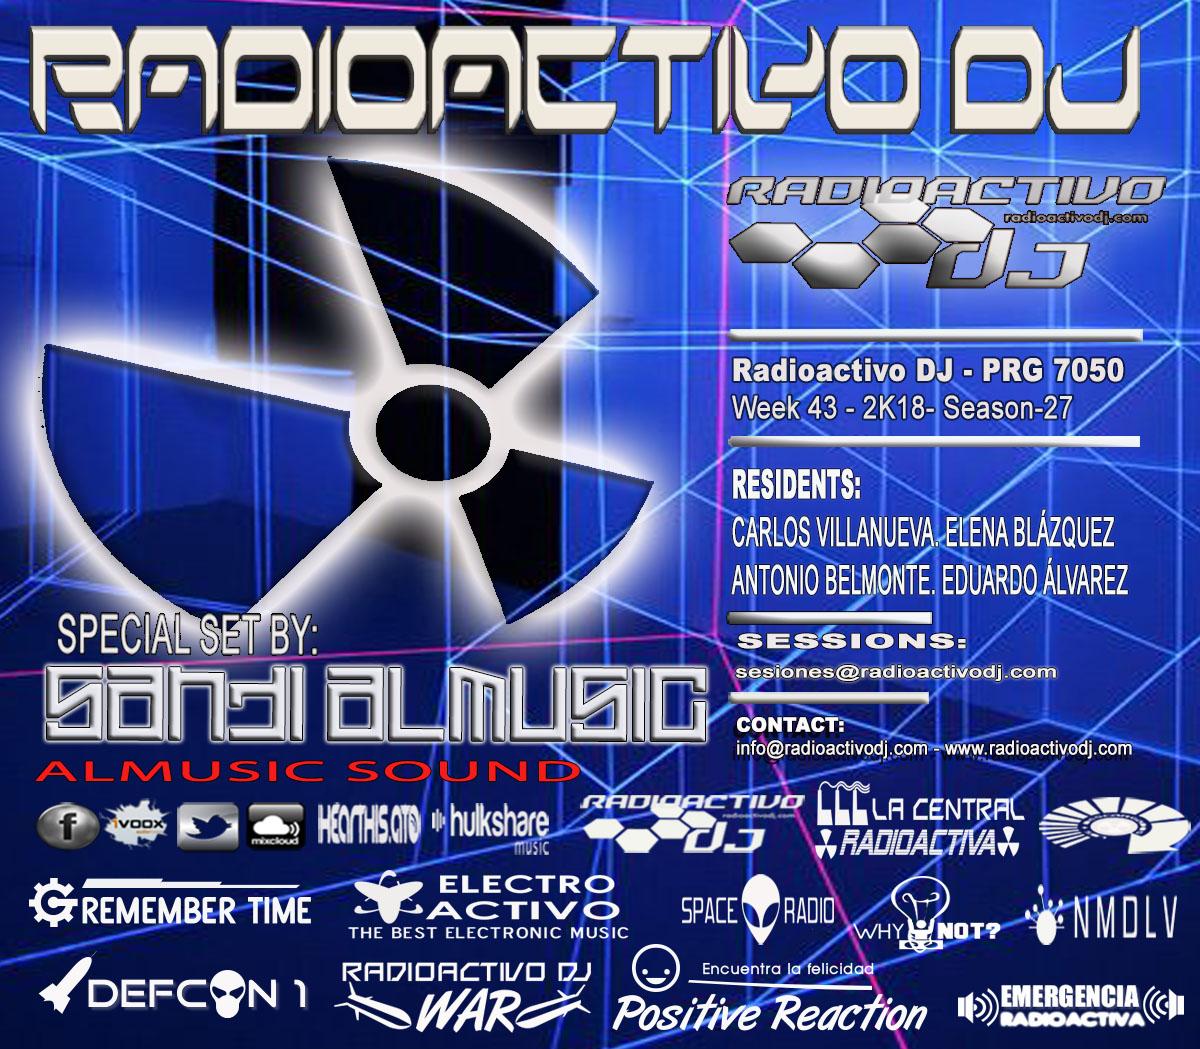 RADIOACTIVO-DJ-43-2018